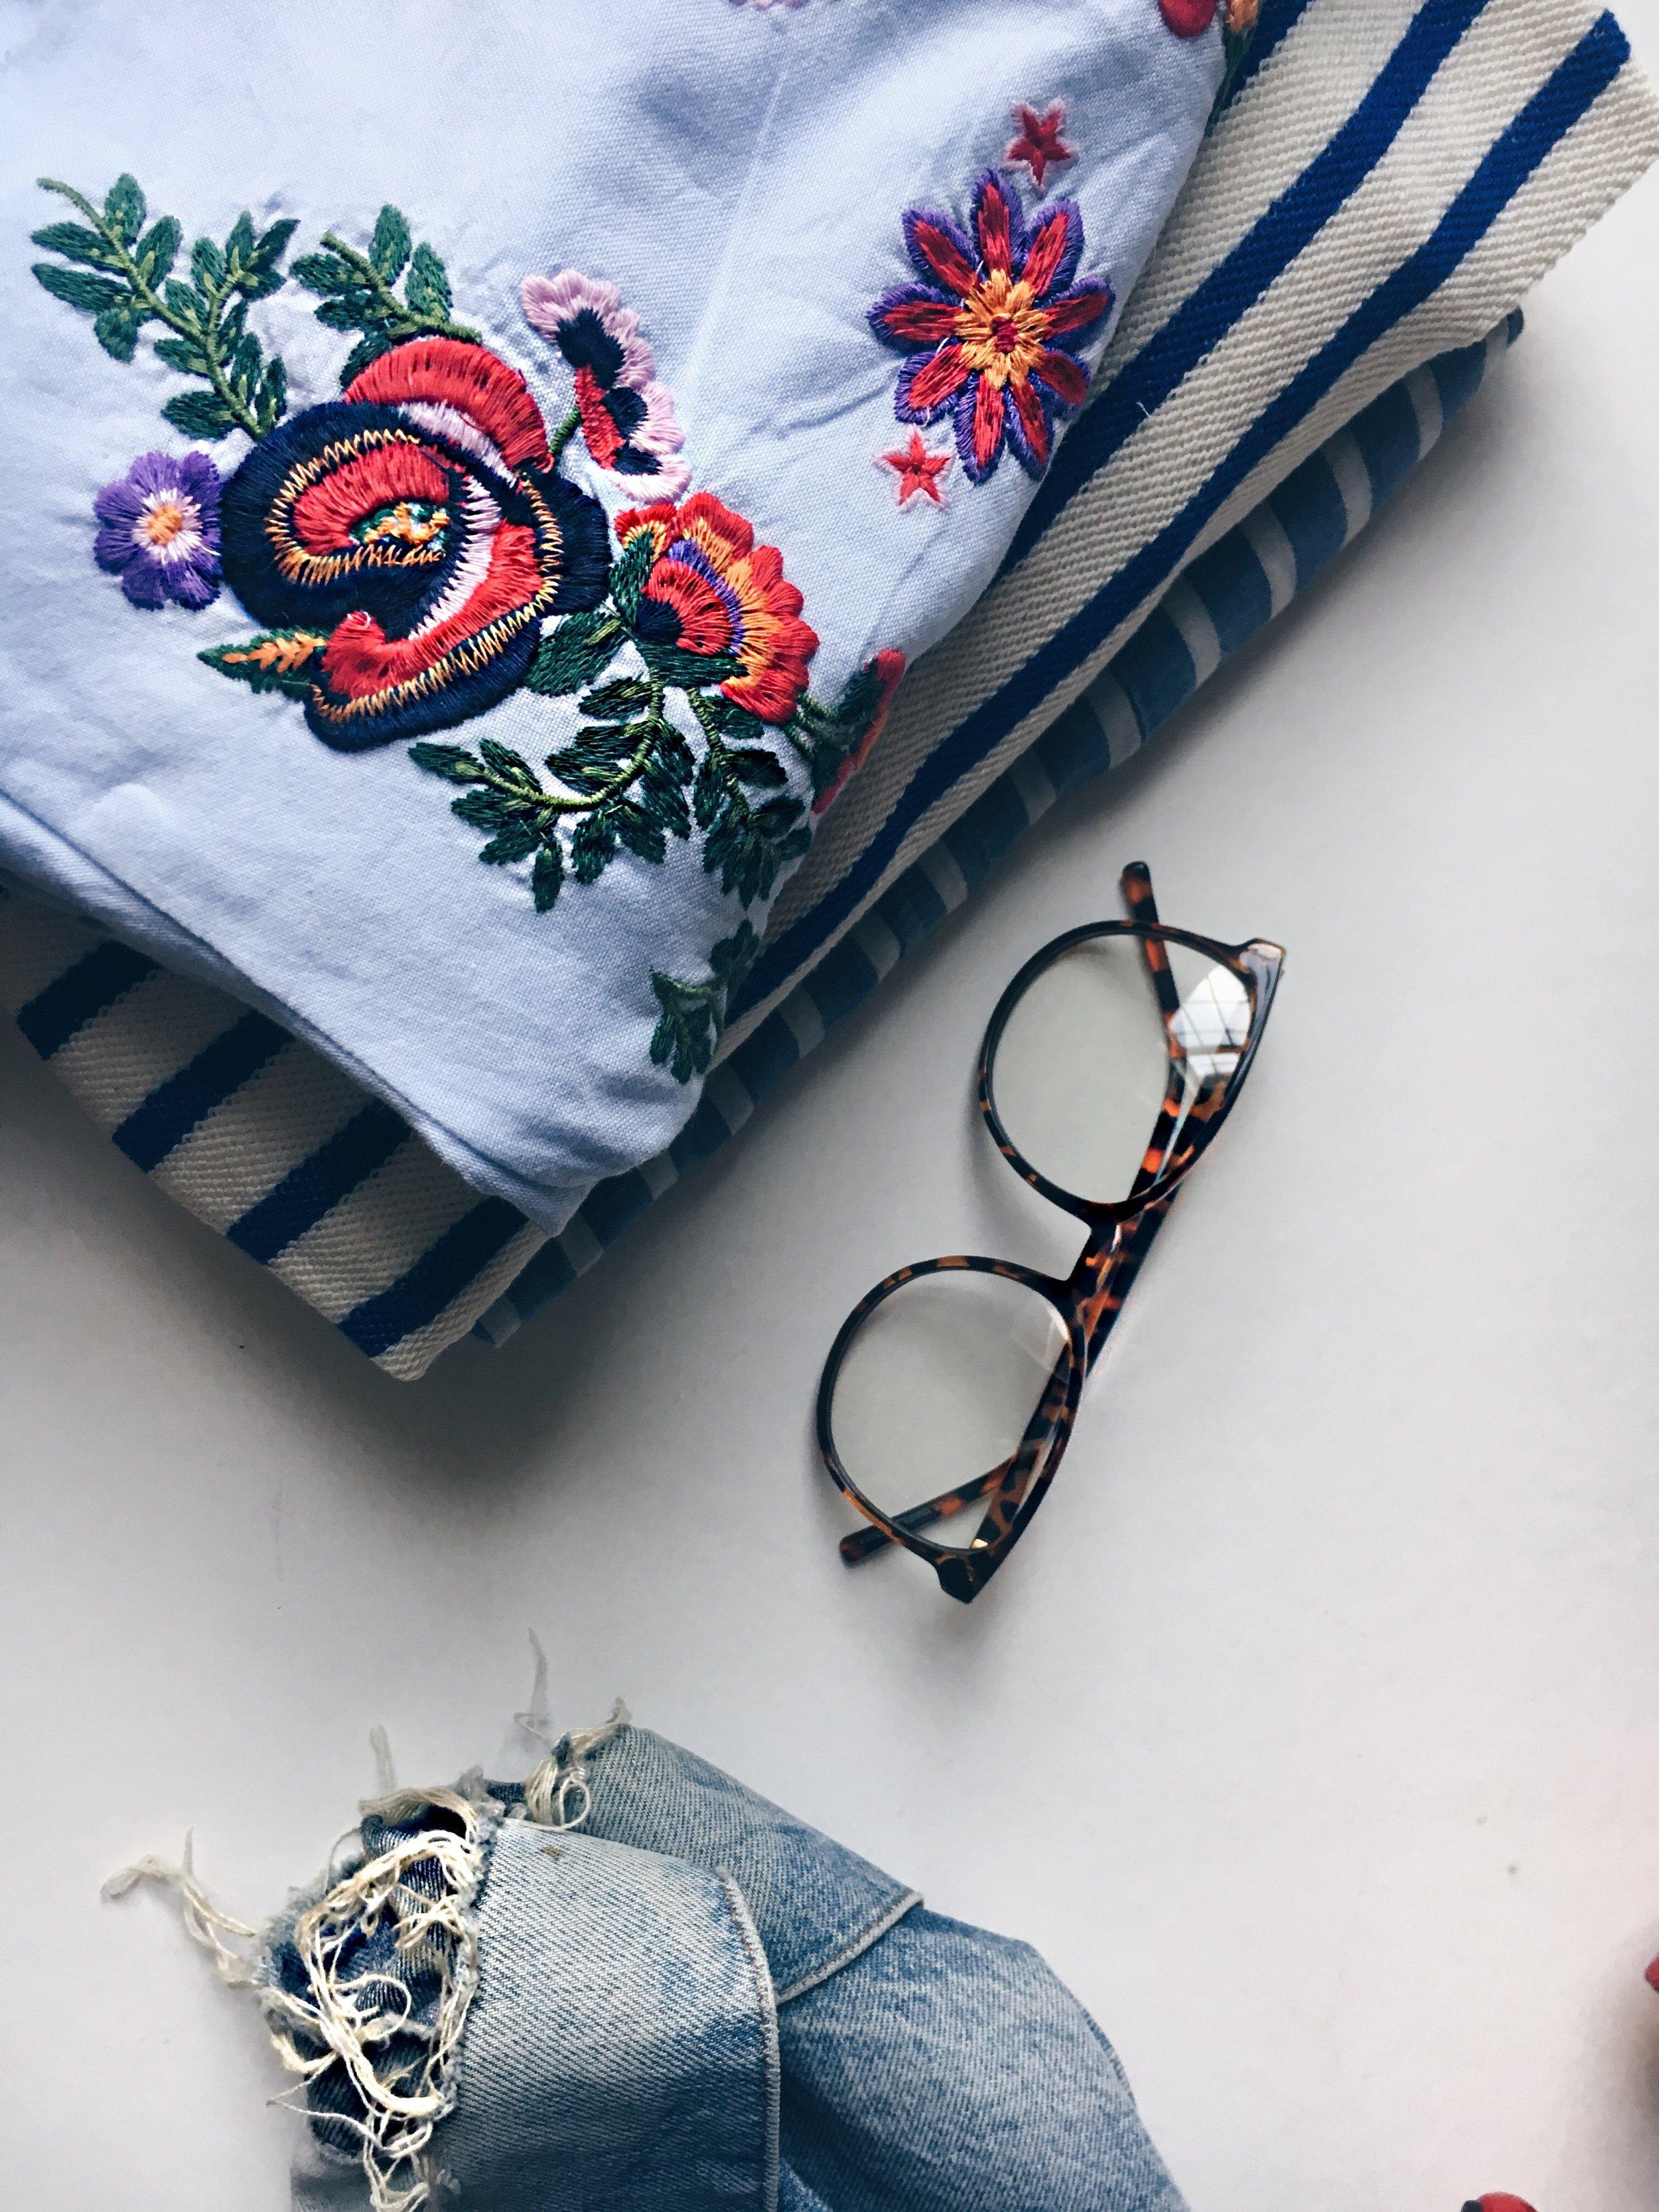 Dress: Zara, Denim Jacket: Vintage Levis, Glasses: Pacsun